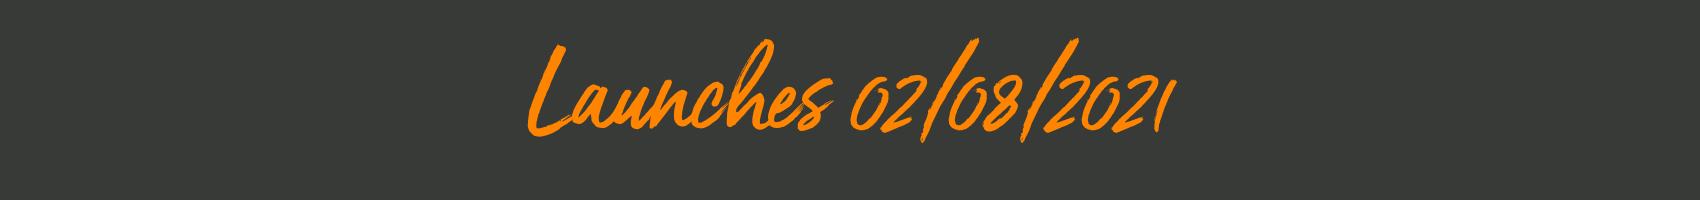 u-pro-launch date banner